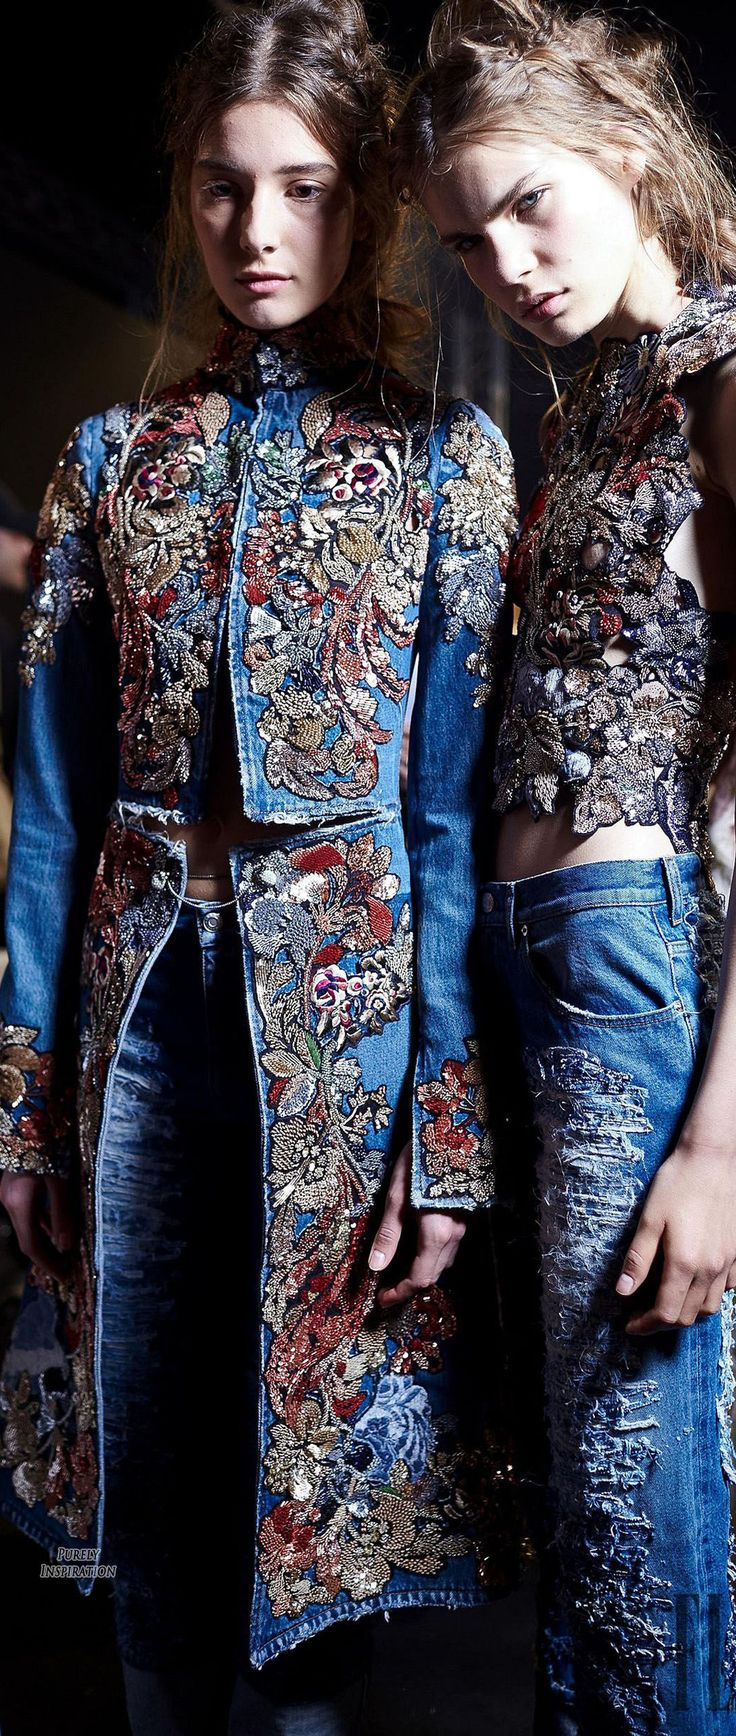 Alexander McQueen SS2016 Women's Fashion RTW (runway details)| Purely Inspiration